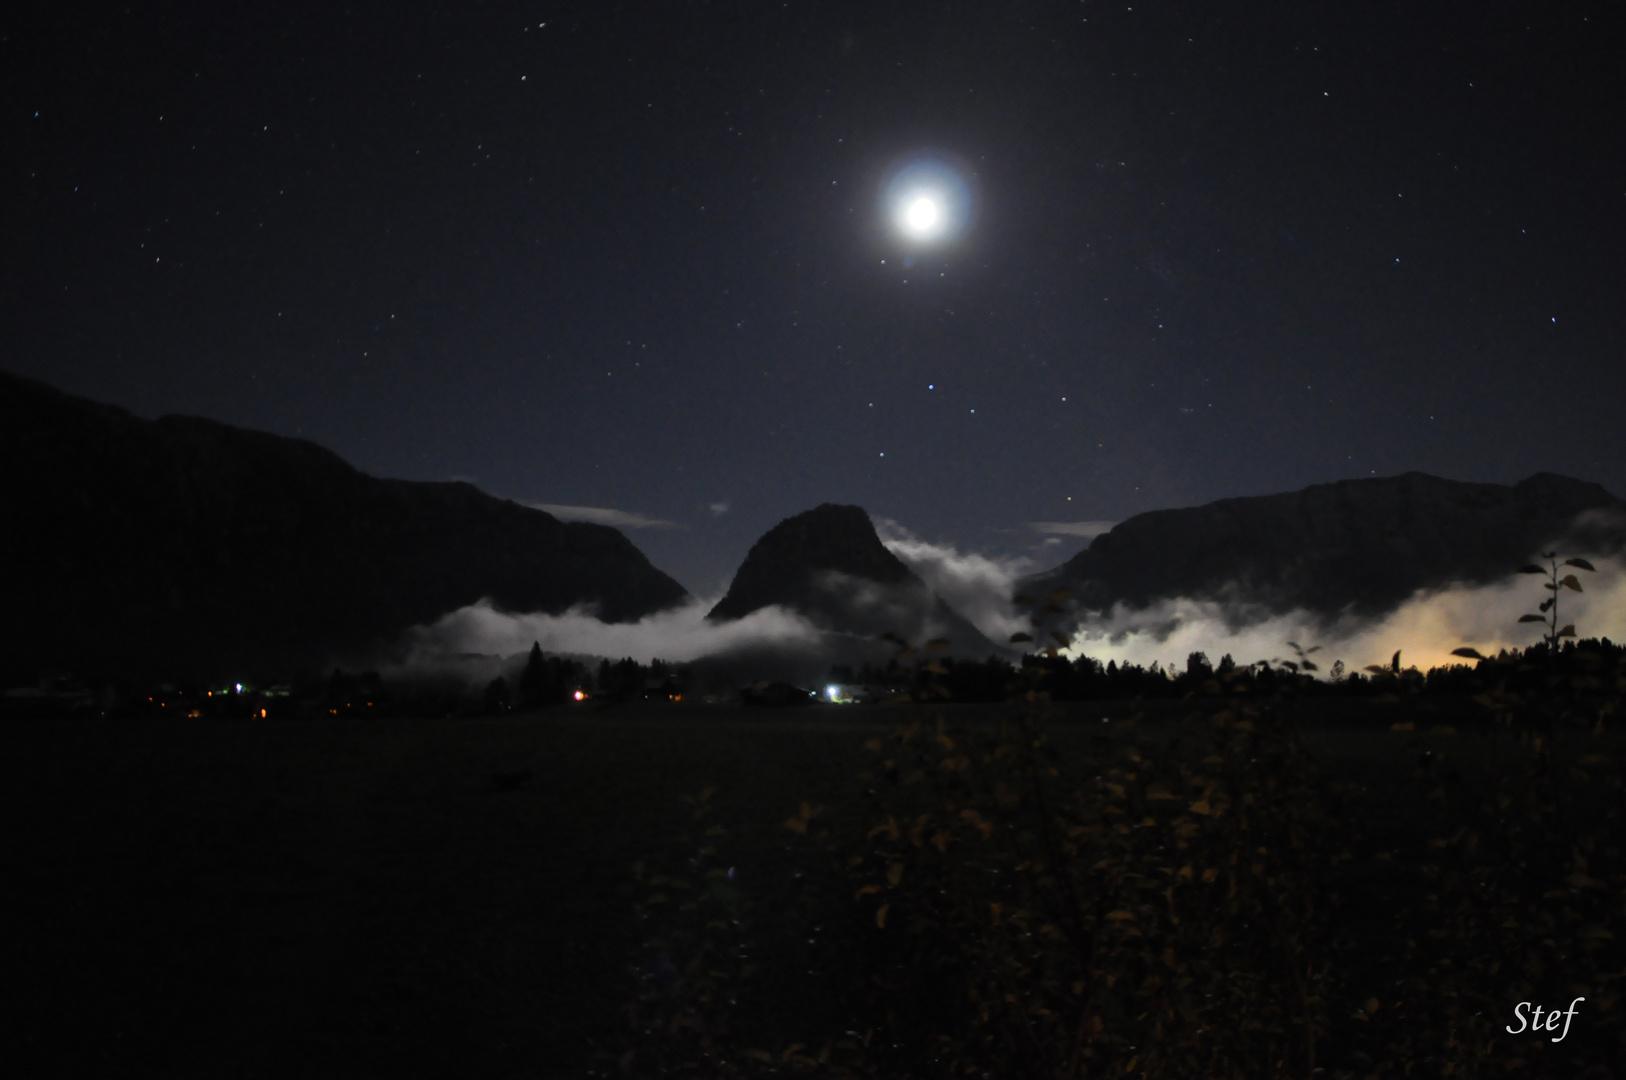 Inzell bei Nacht